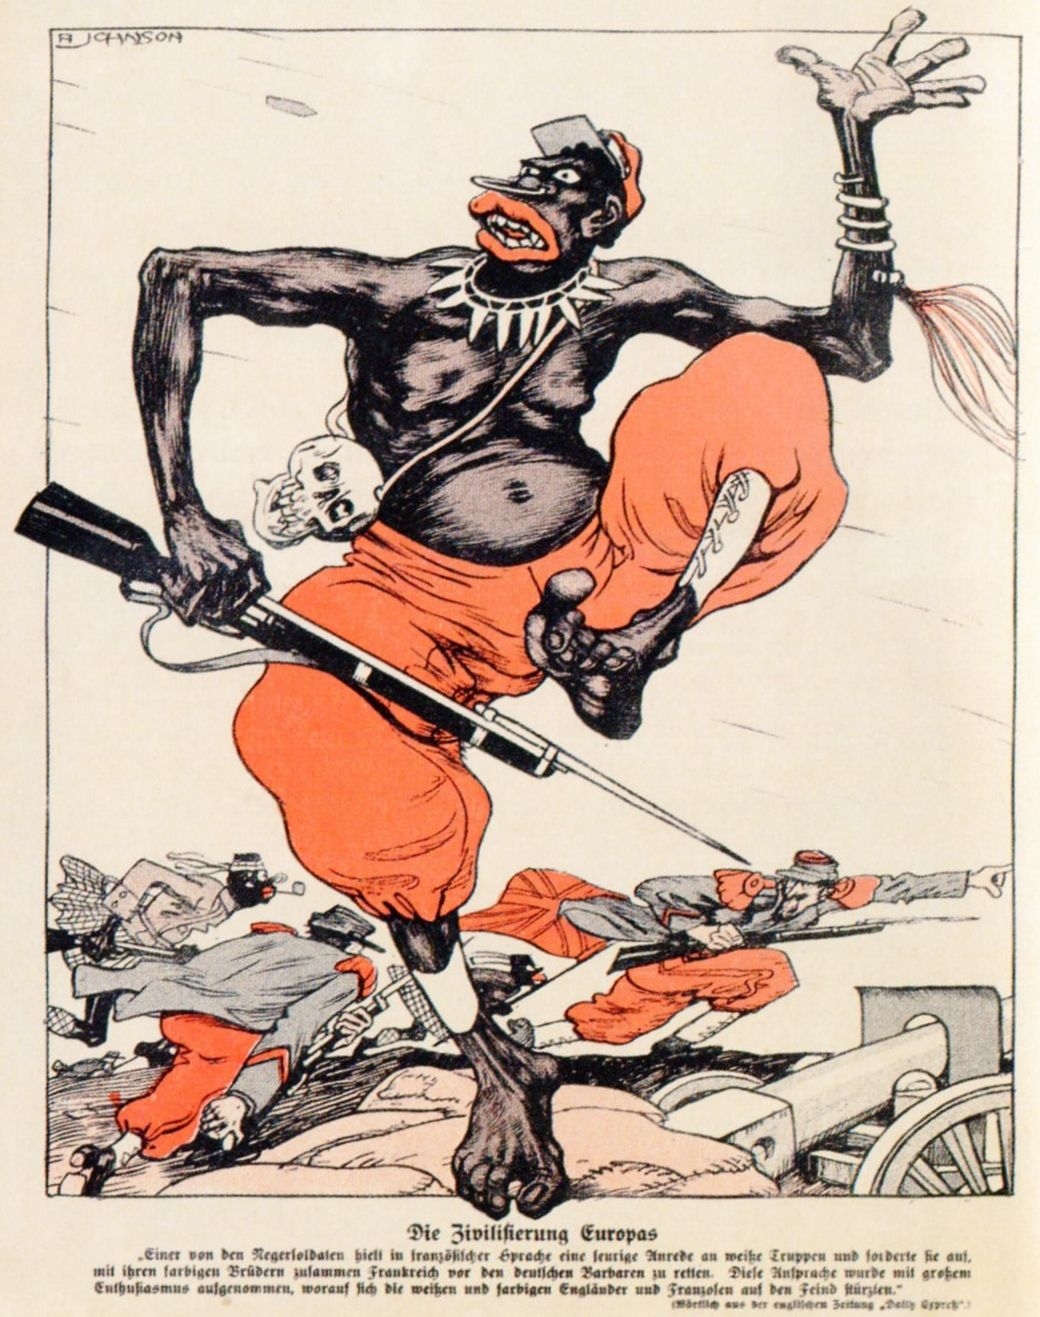 A Johnson Die Zivilisierung Europas In Kladderadatsch Duitsland 23 Juli 1916 Senegalese Soldaat Meevec Propaganda Posters Propaganda Vintage Comics